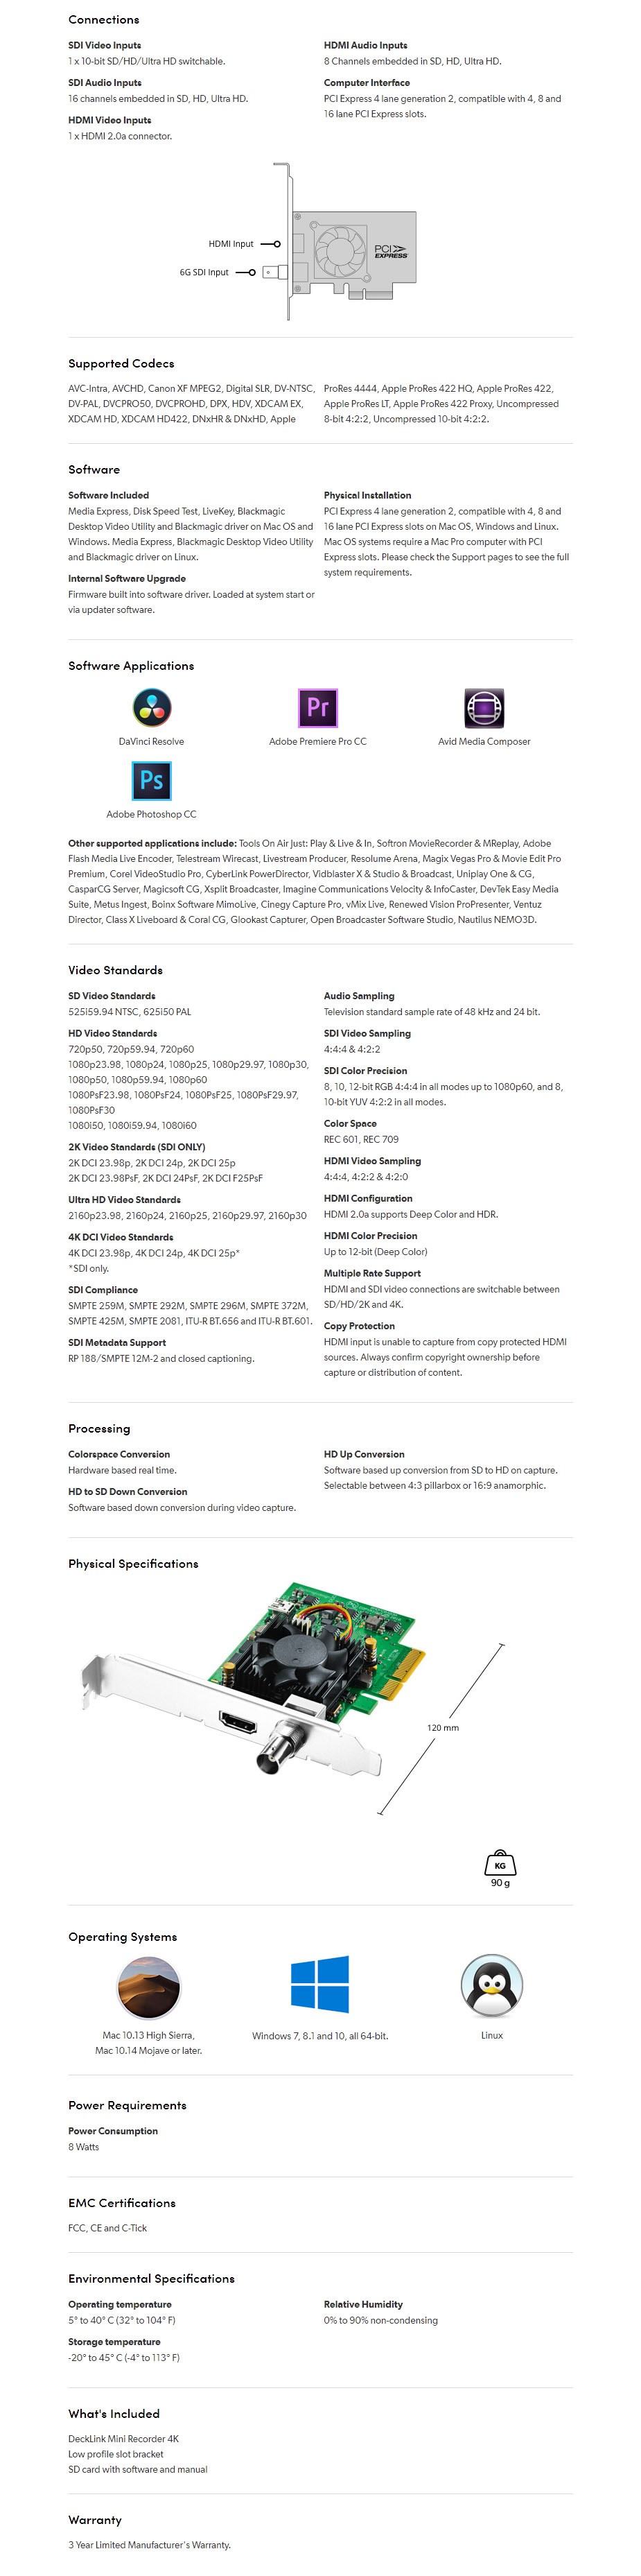 Blackmagic Design DeckLink 4K Mini Recorder - Overview 1